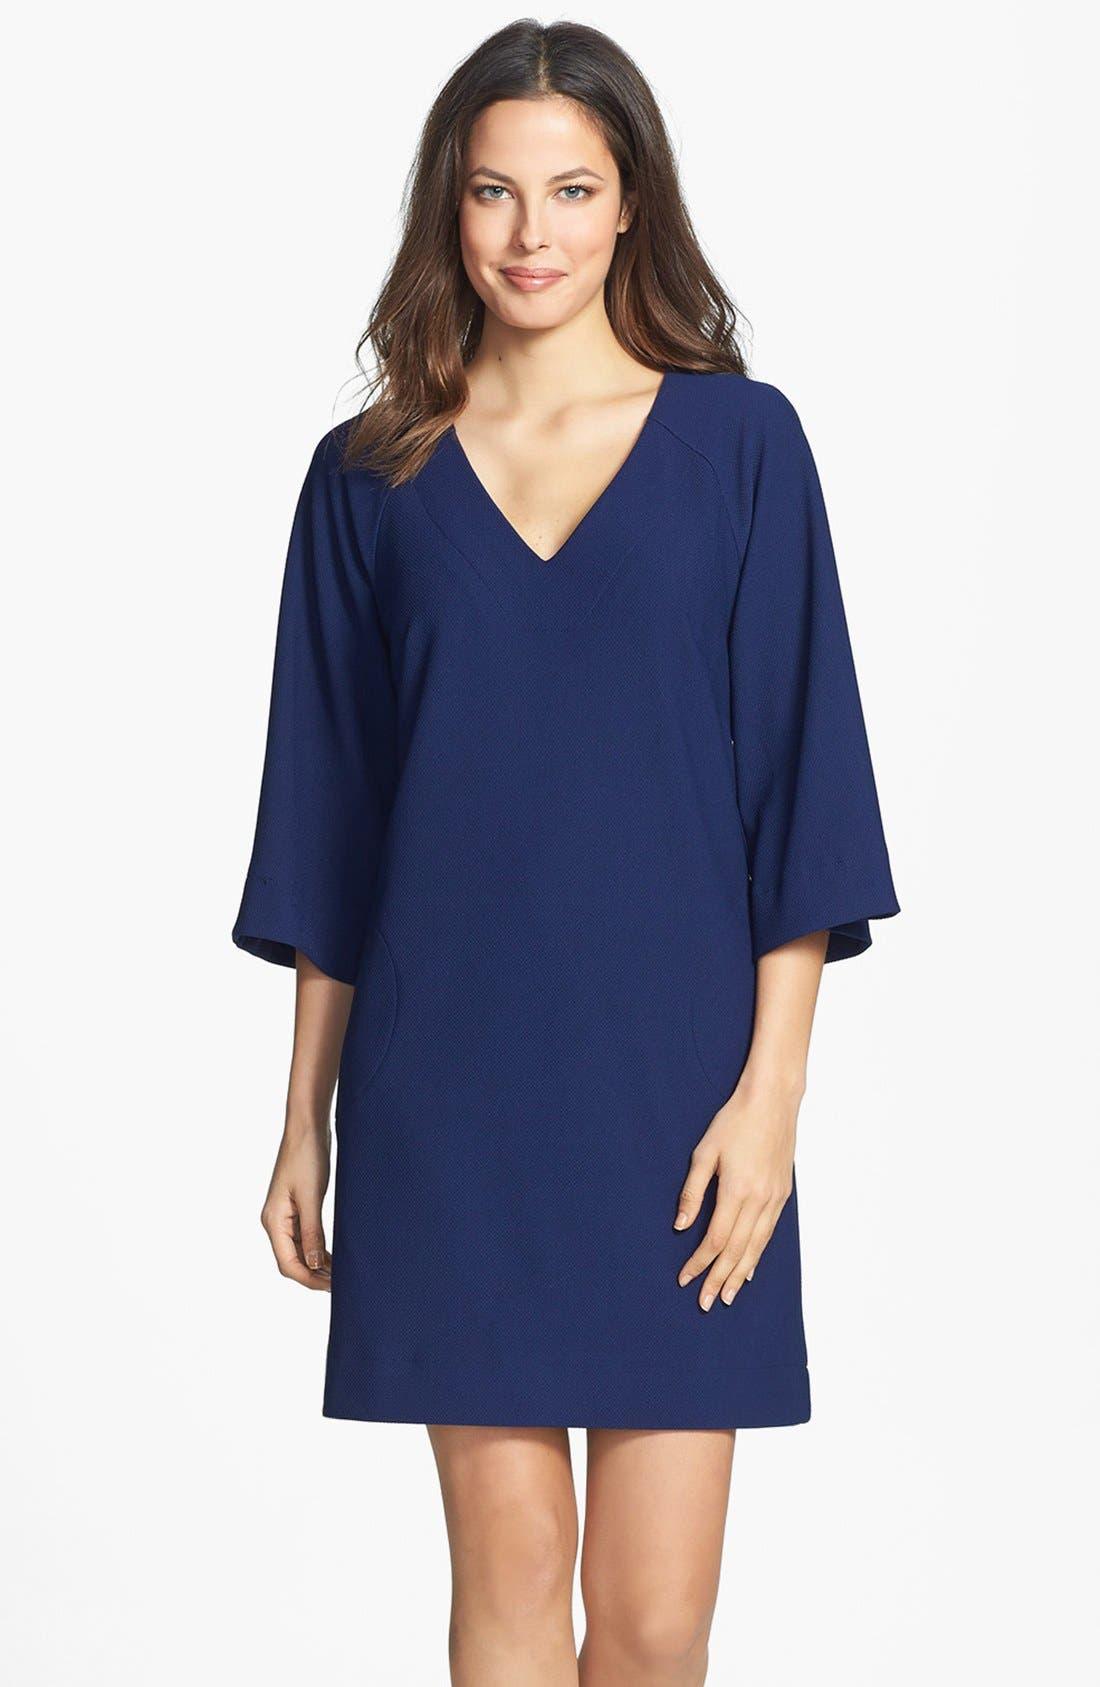 Alternate Image 1 Selected - Donna Ricco Ottoman Piqué Shift Dress